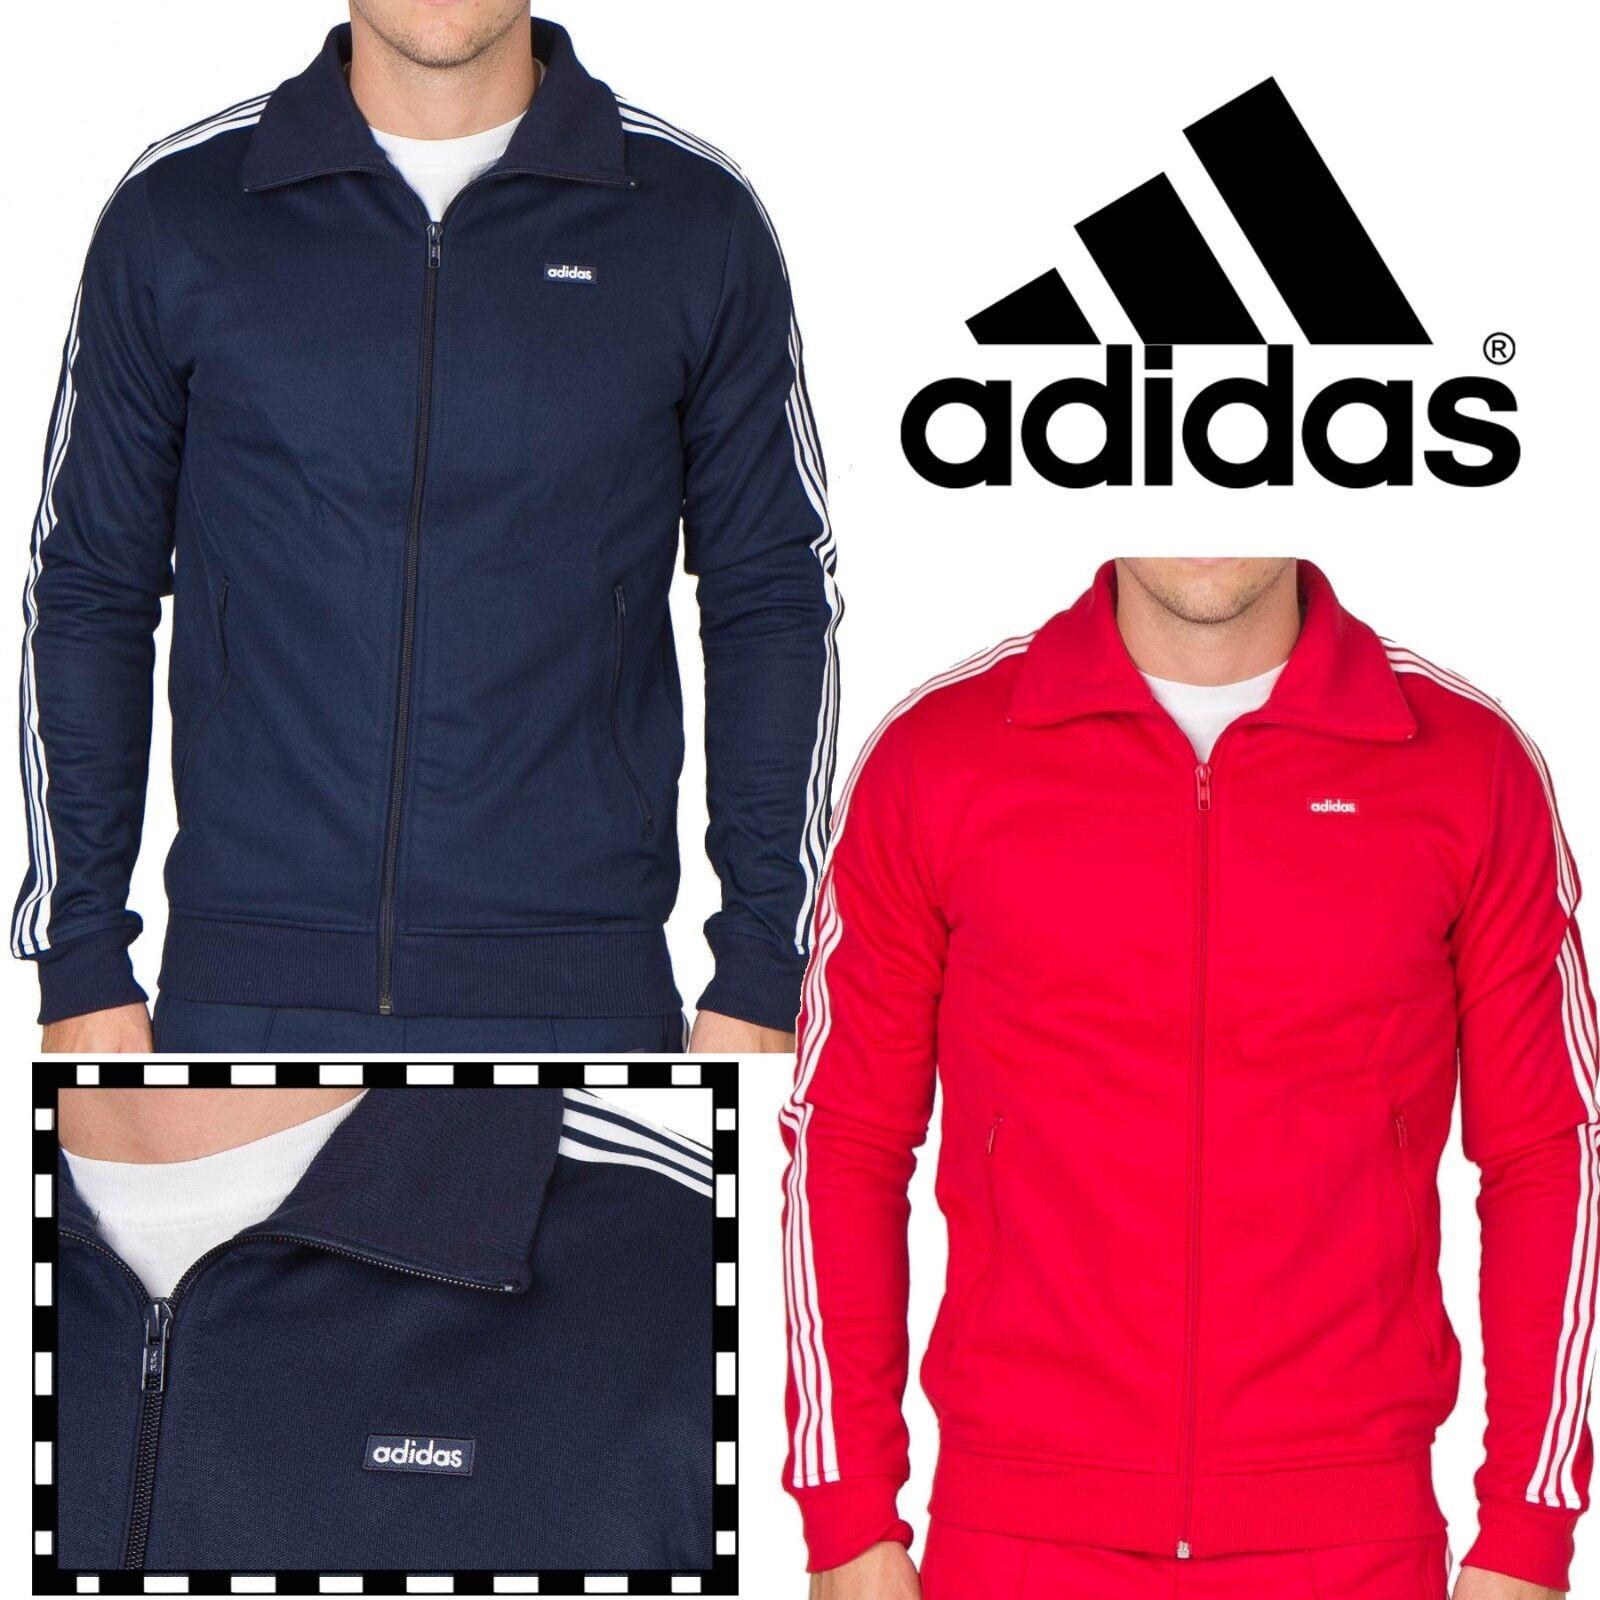 ea4df24b395f adidas Originals Beckenbauer Track Jackets Full Zip Sports Top CLEARANCE  SALE